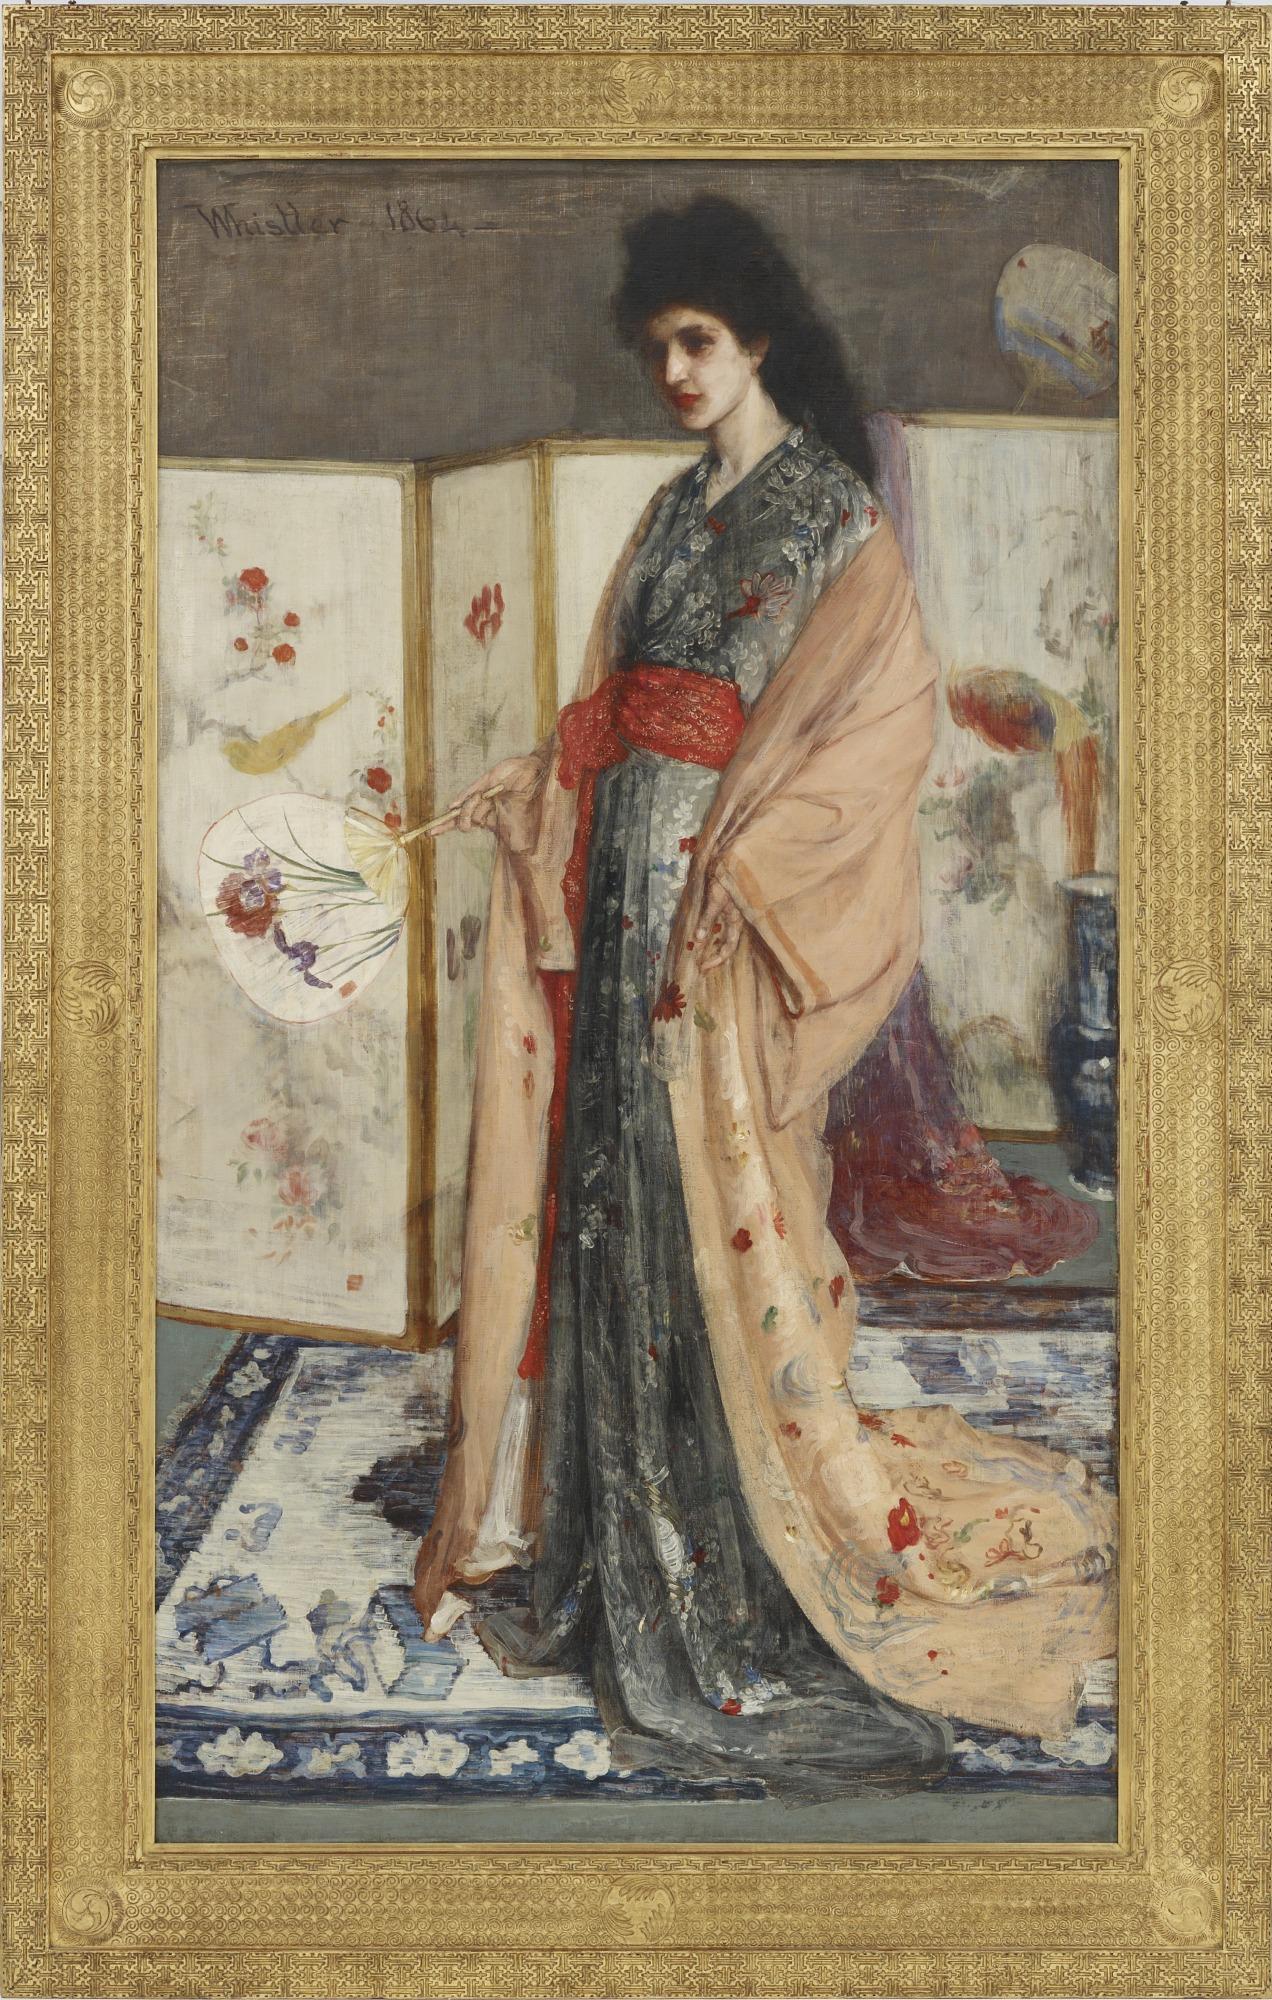 images for The Princess from the Land of Porcelain (<i>La Princesse du pays de la porcelaine</i>)